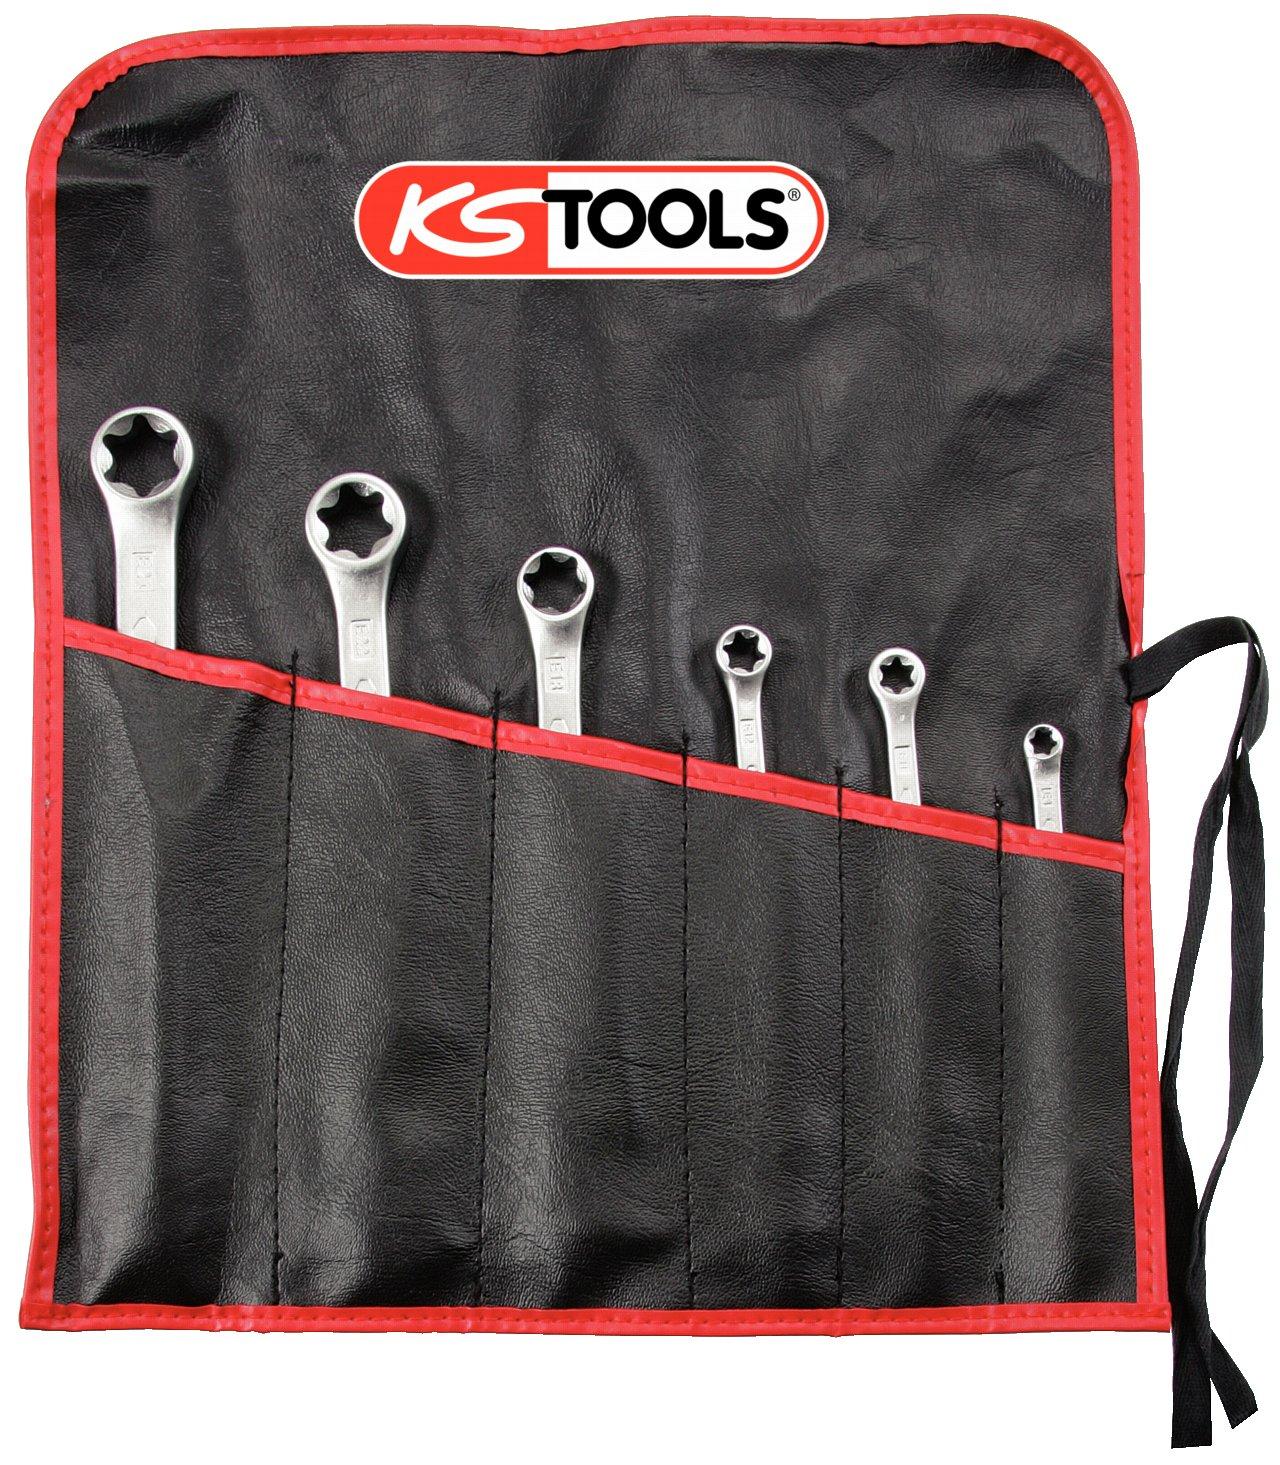 KS Tools 911.0370 CLASSIC TX-E-Doppel-Ringschlü ssel-Satz, 6-tlg. KS-Tools Werkzeuge-Maschine 4042146042922